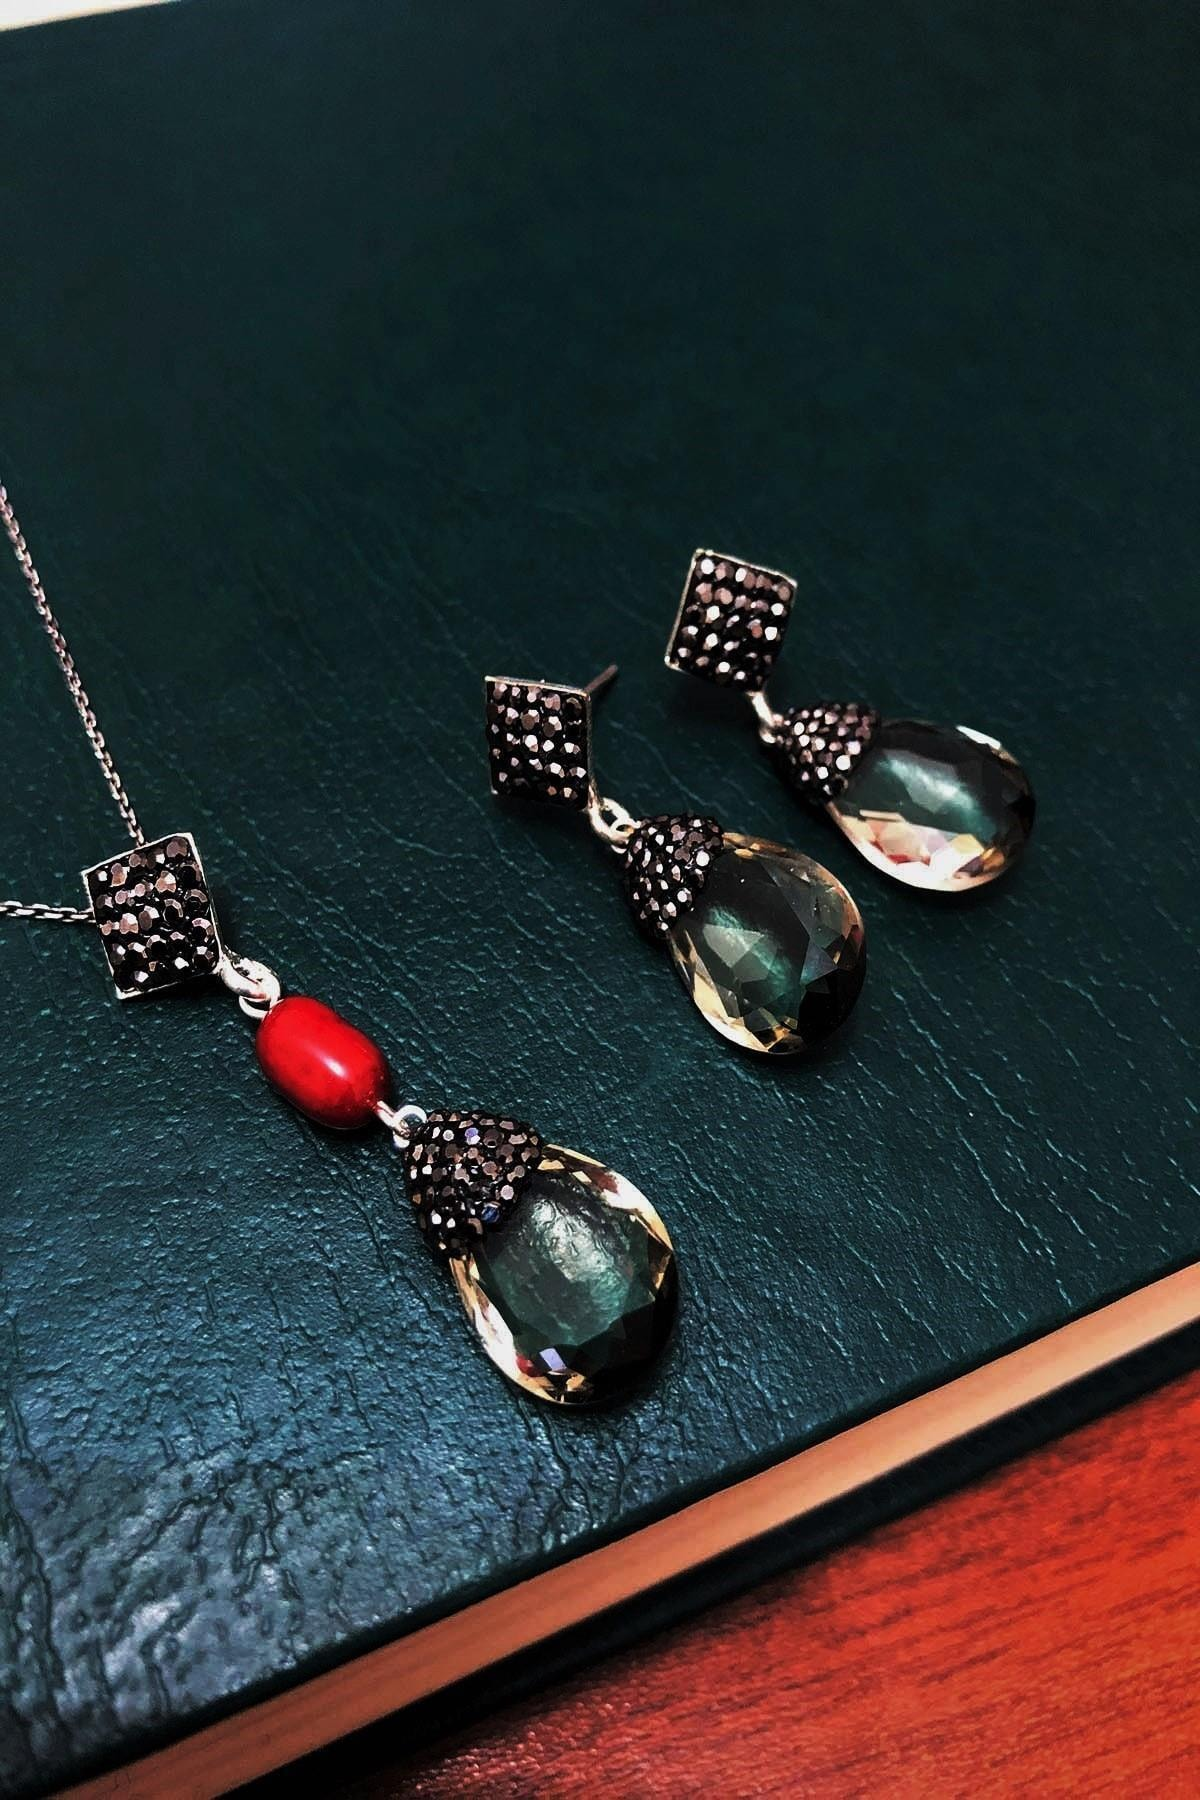 Dr. Stone Kadın Topaz Rengi Hindistan Kristali Ve Mercan Gümüş Set Xdrsott7 1